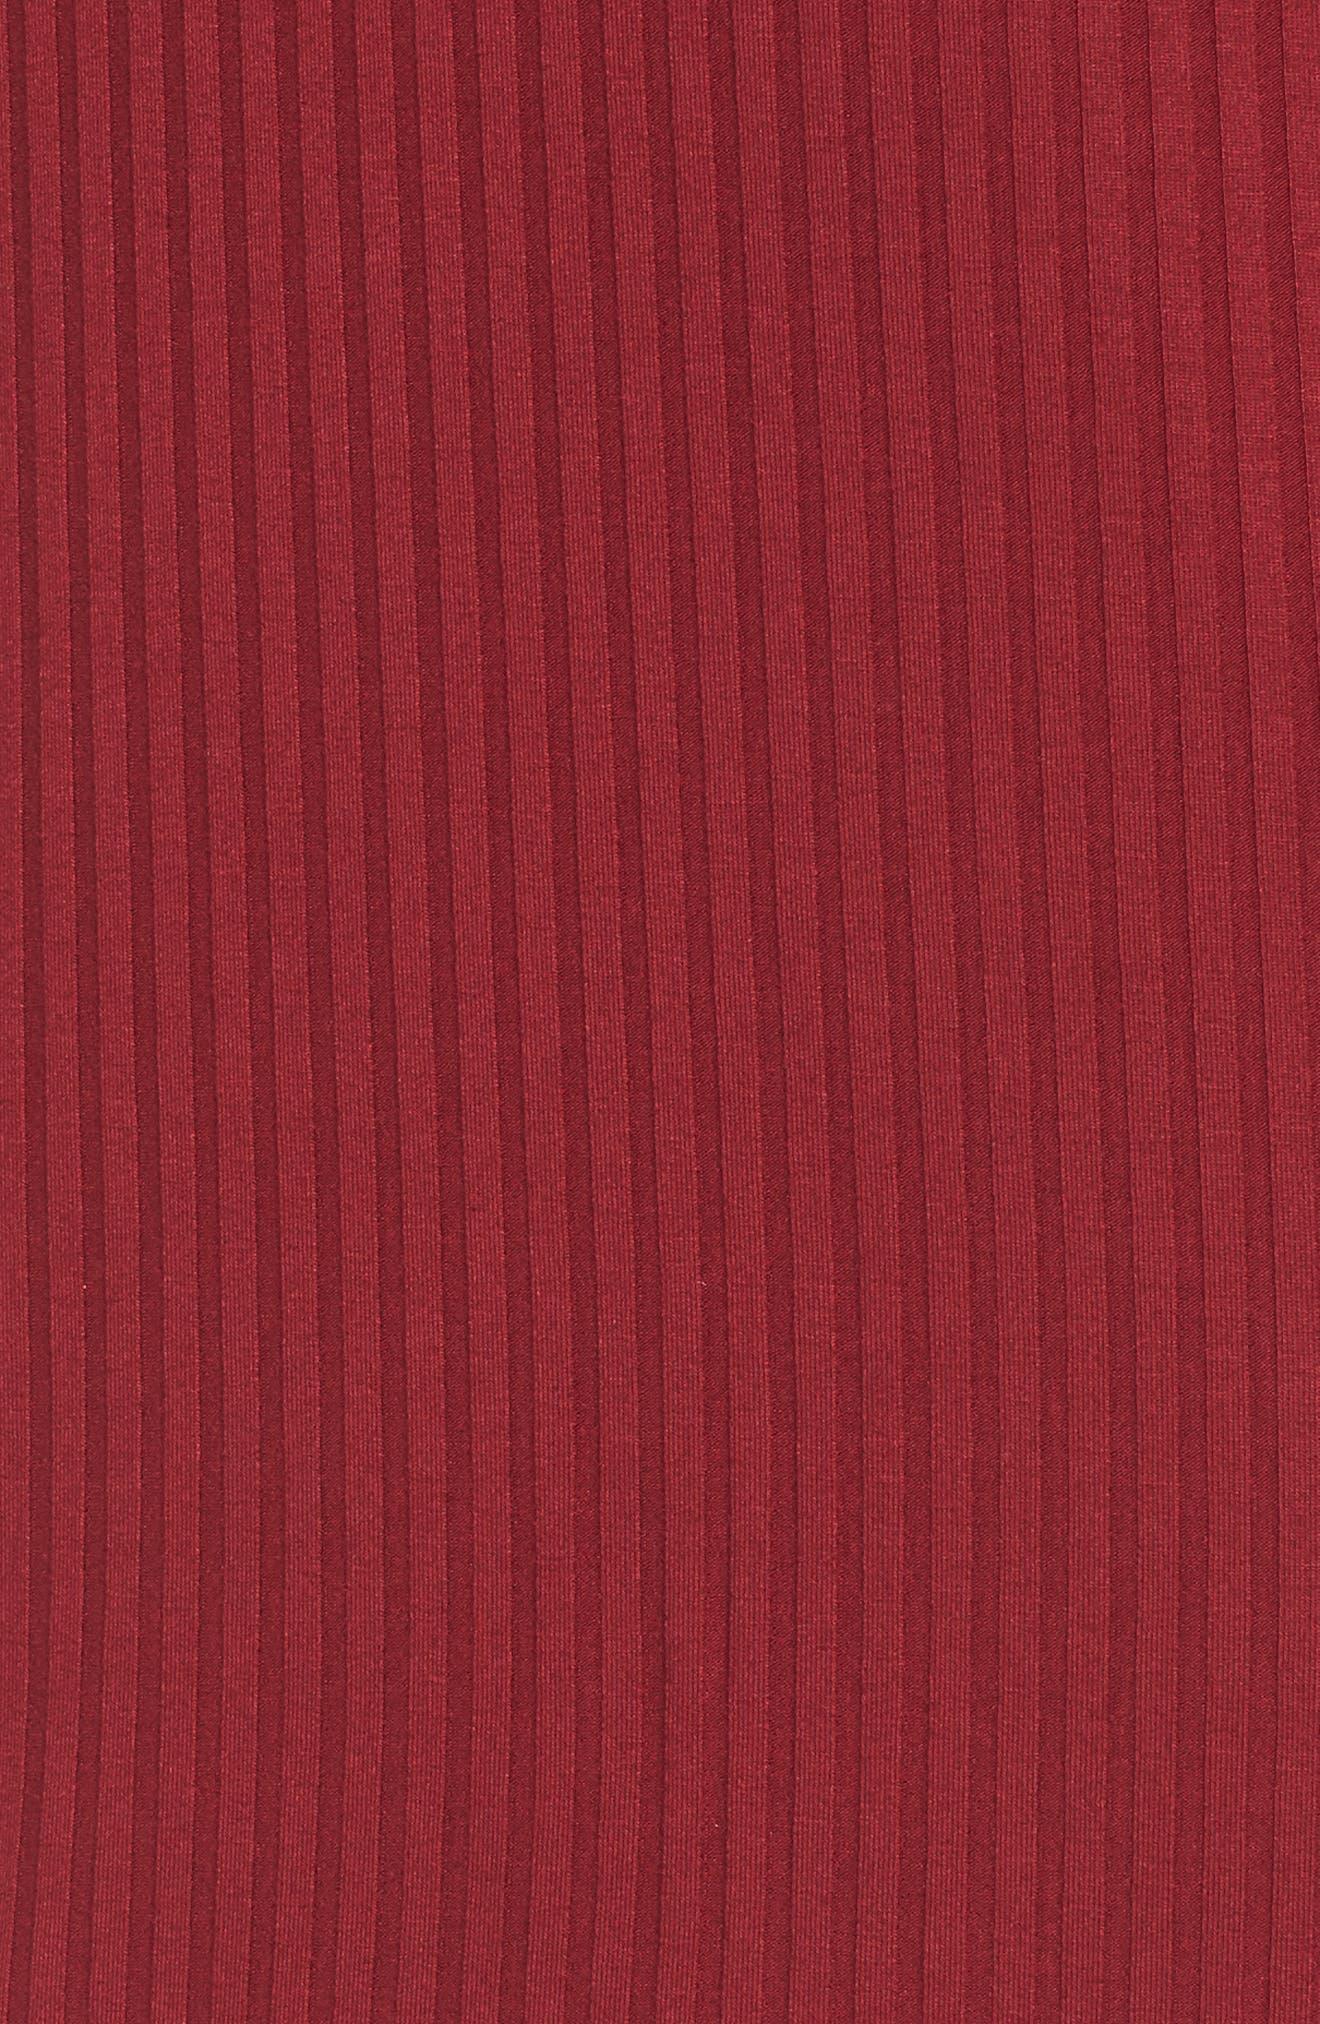 Alternate Image 5  - One Clothing Off the Shoulder Rib Knit Dress